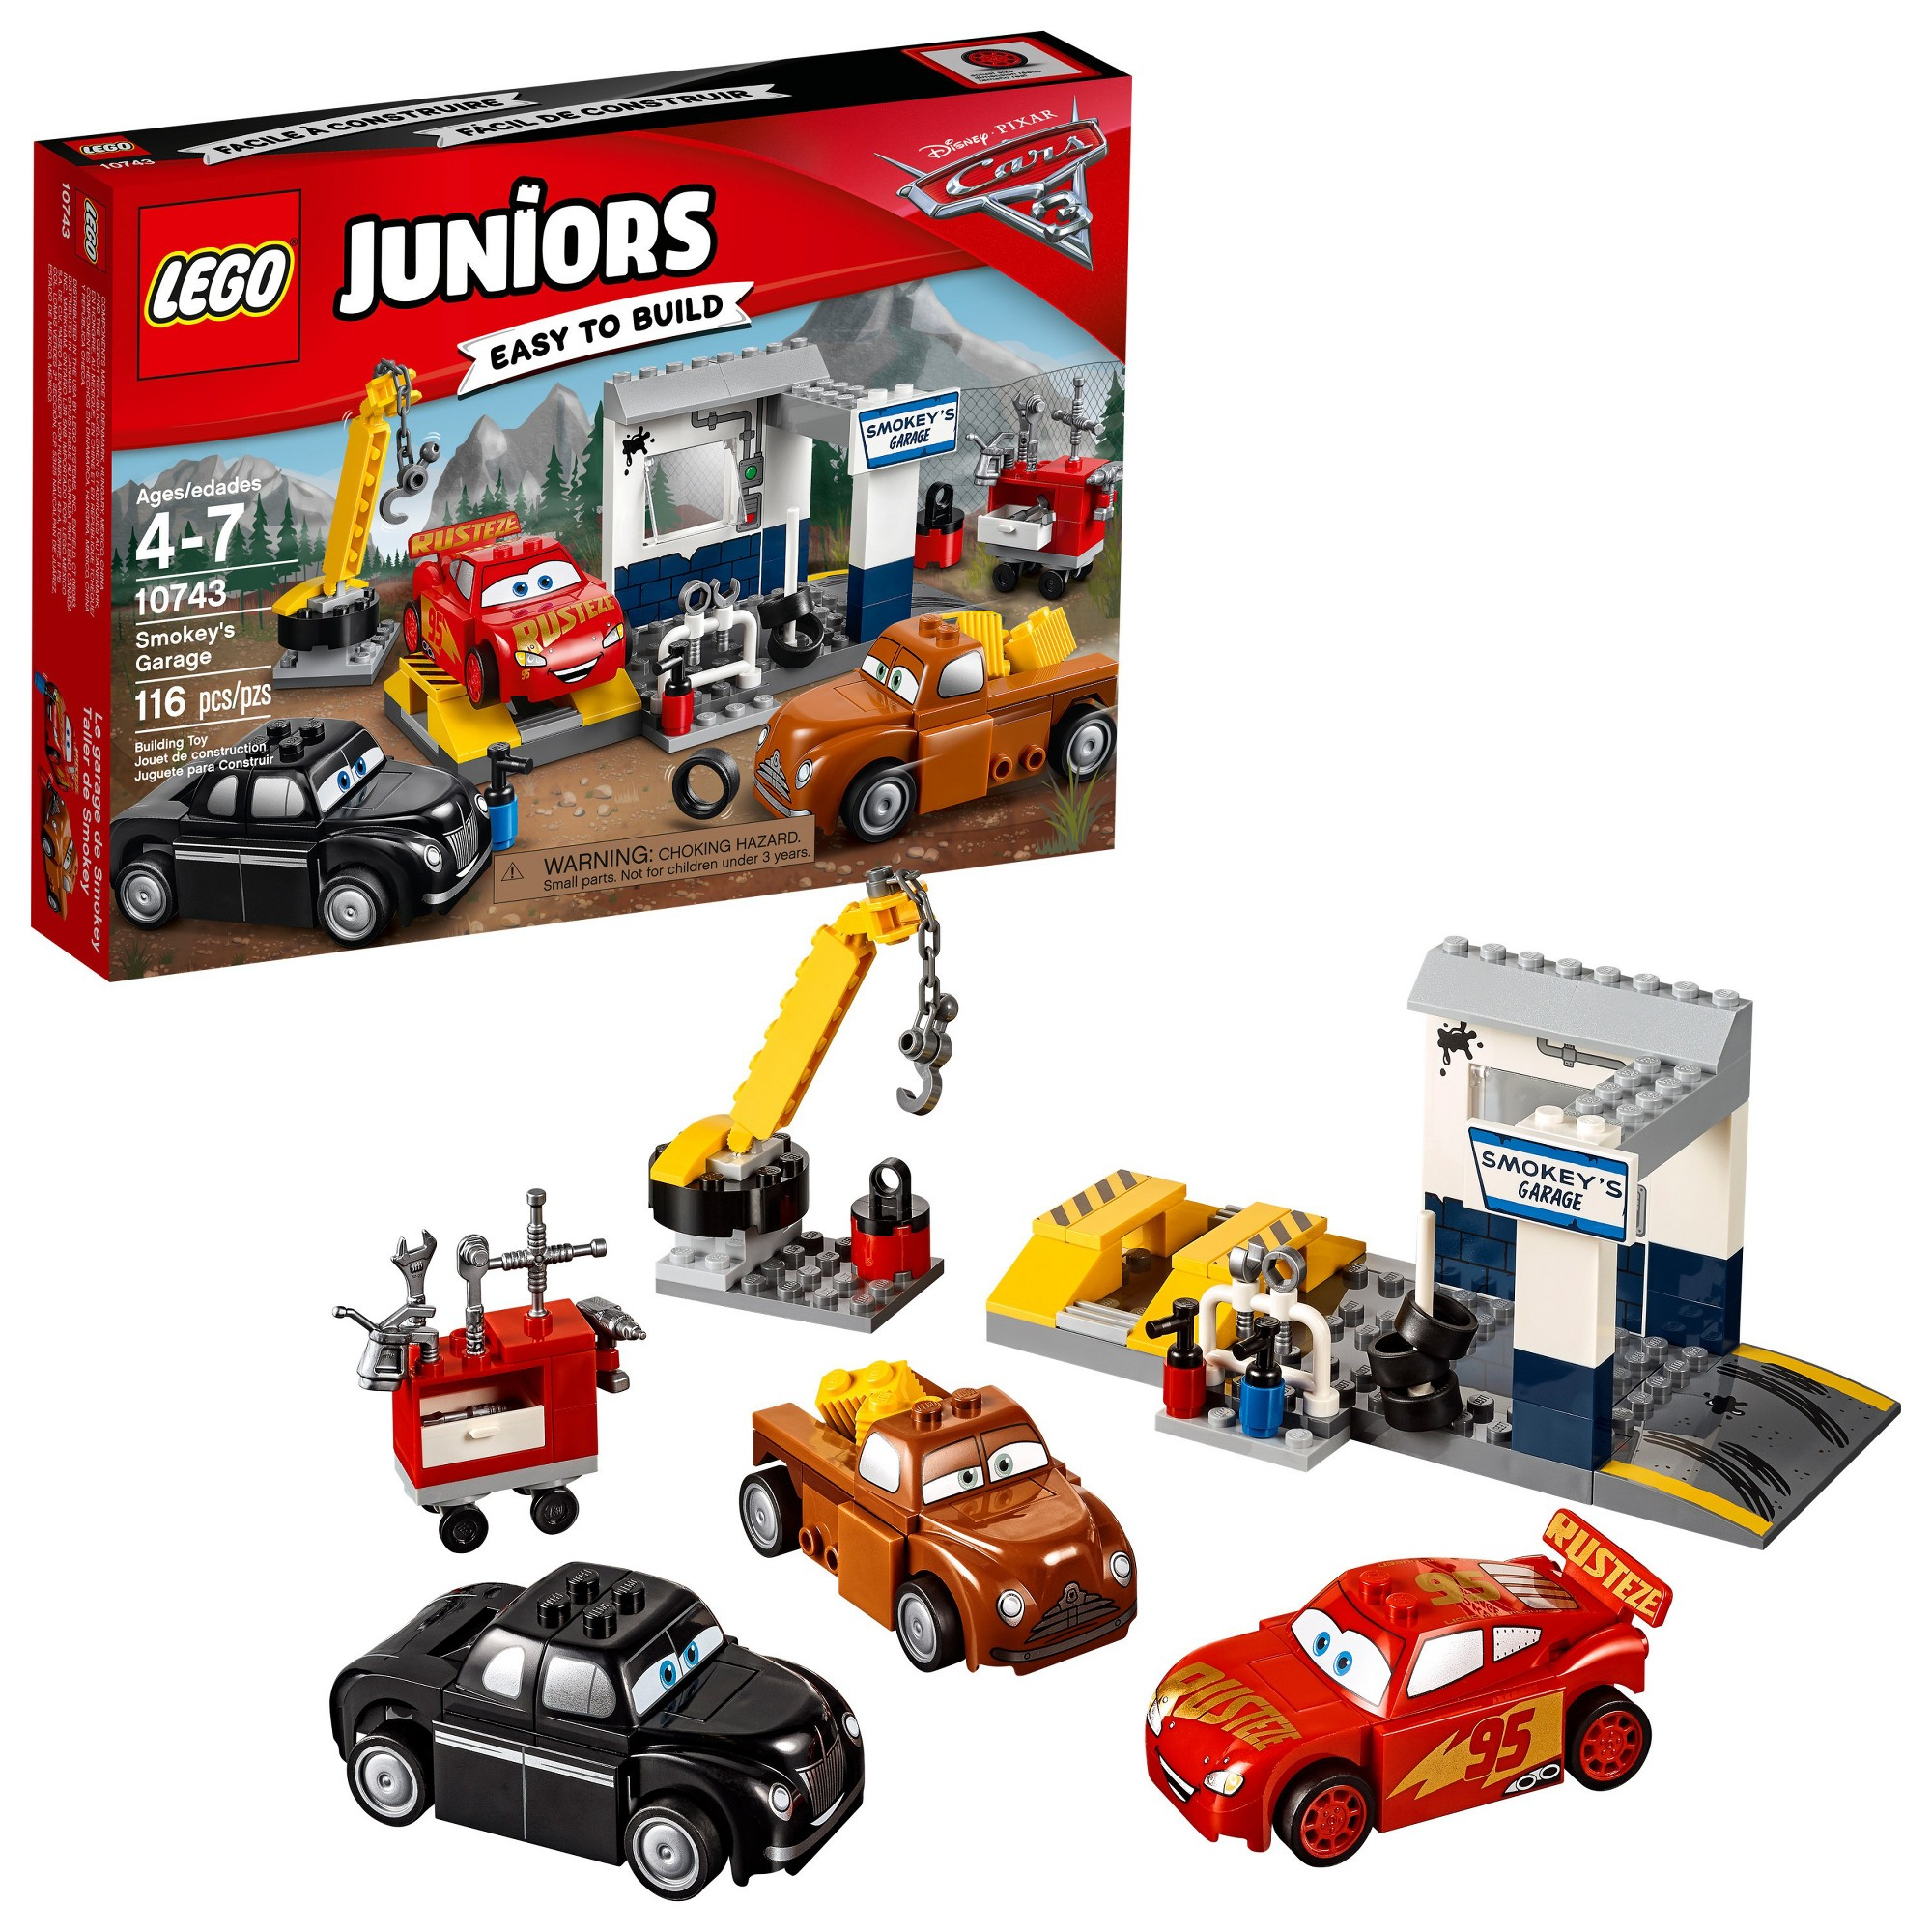 Lego Juniors Disneypixar Cars 3 Smokey S Garage 10743 Lego